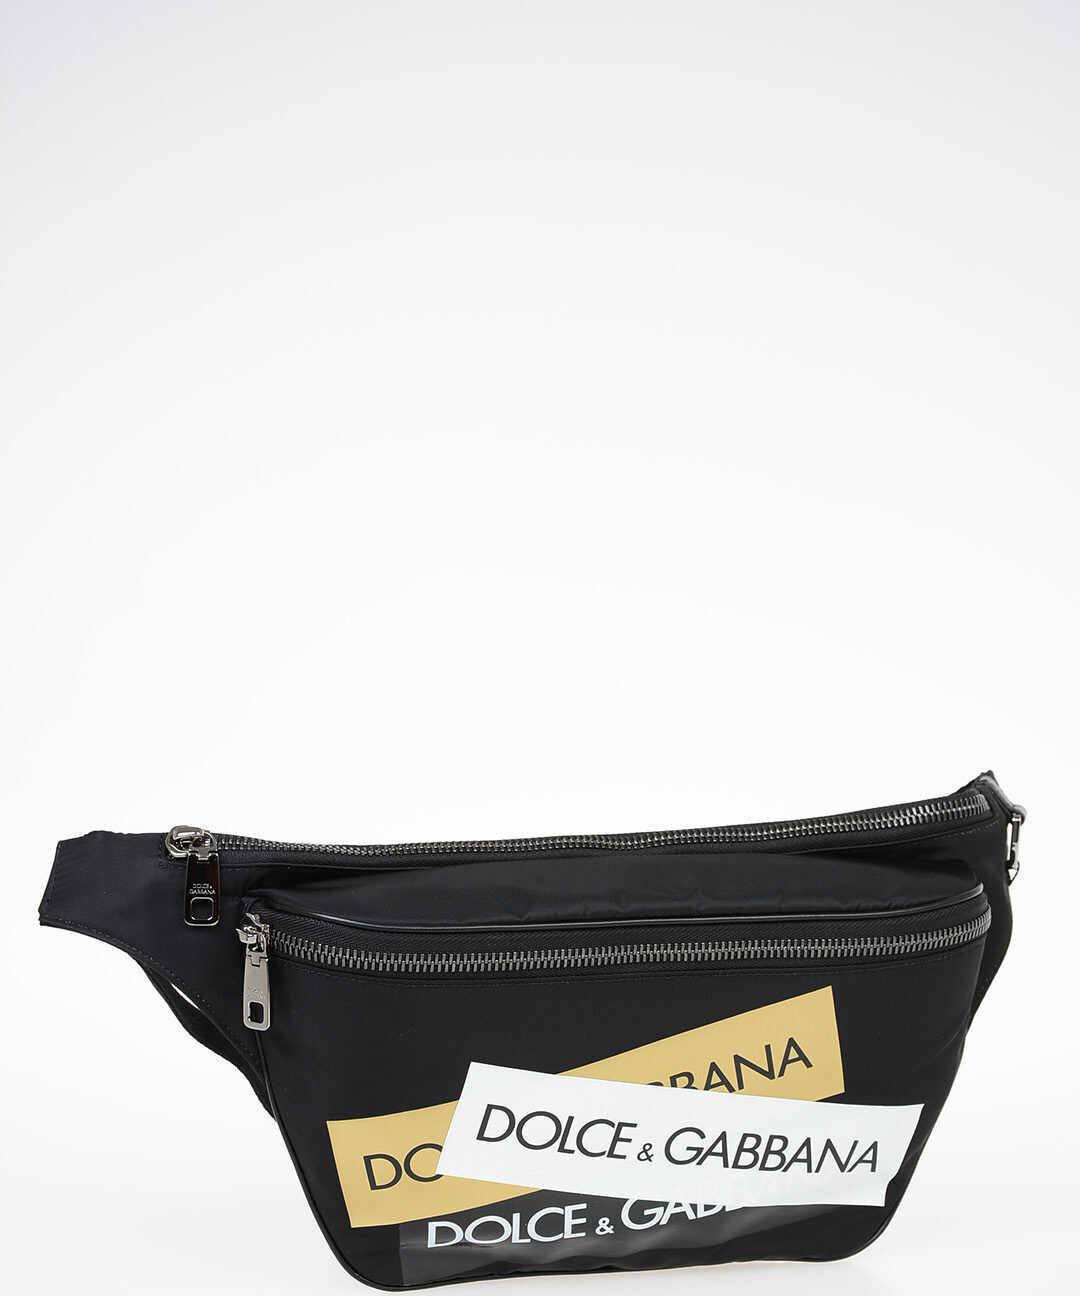 Dolce & Gabbana Fabric Beltbag BLACK